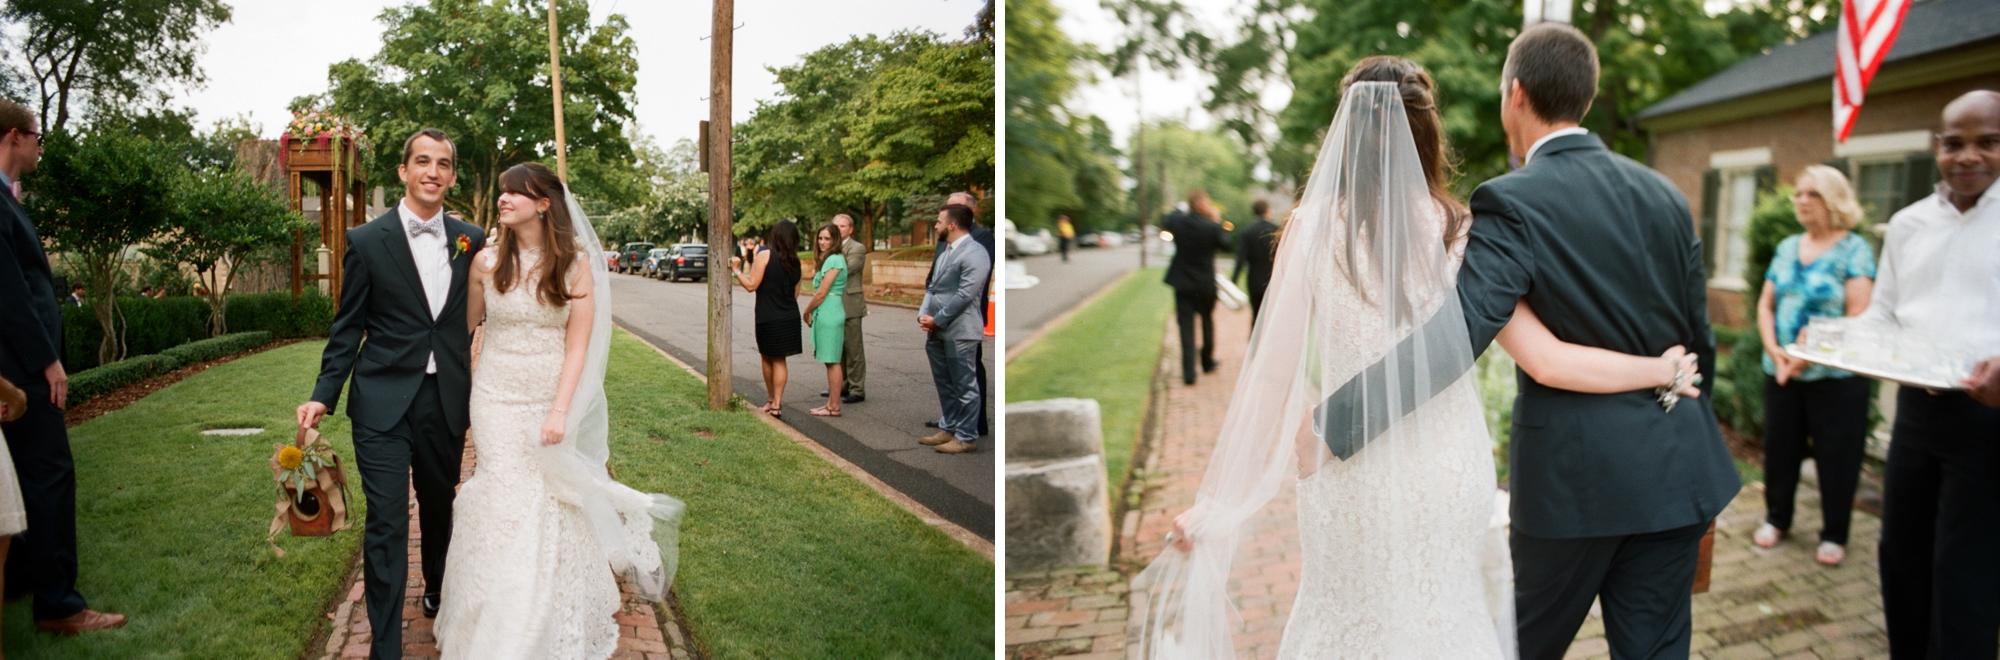 southern film wedding photographer_0089